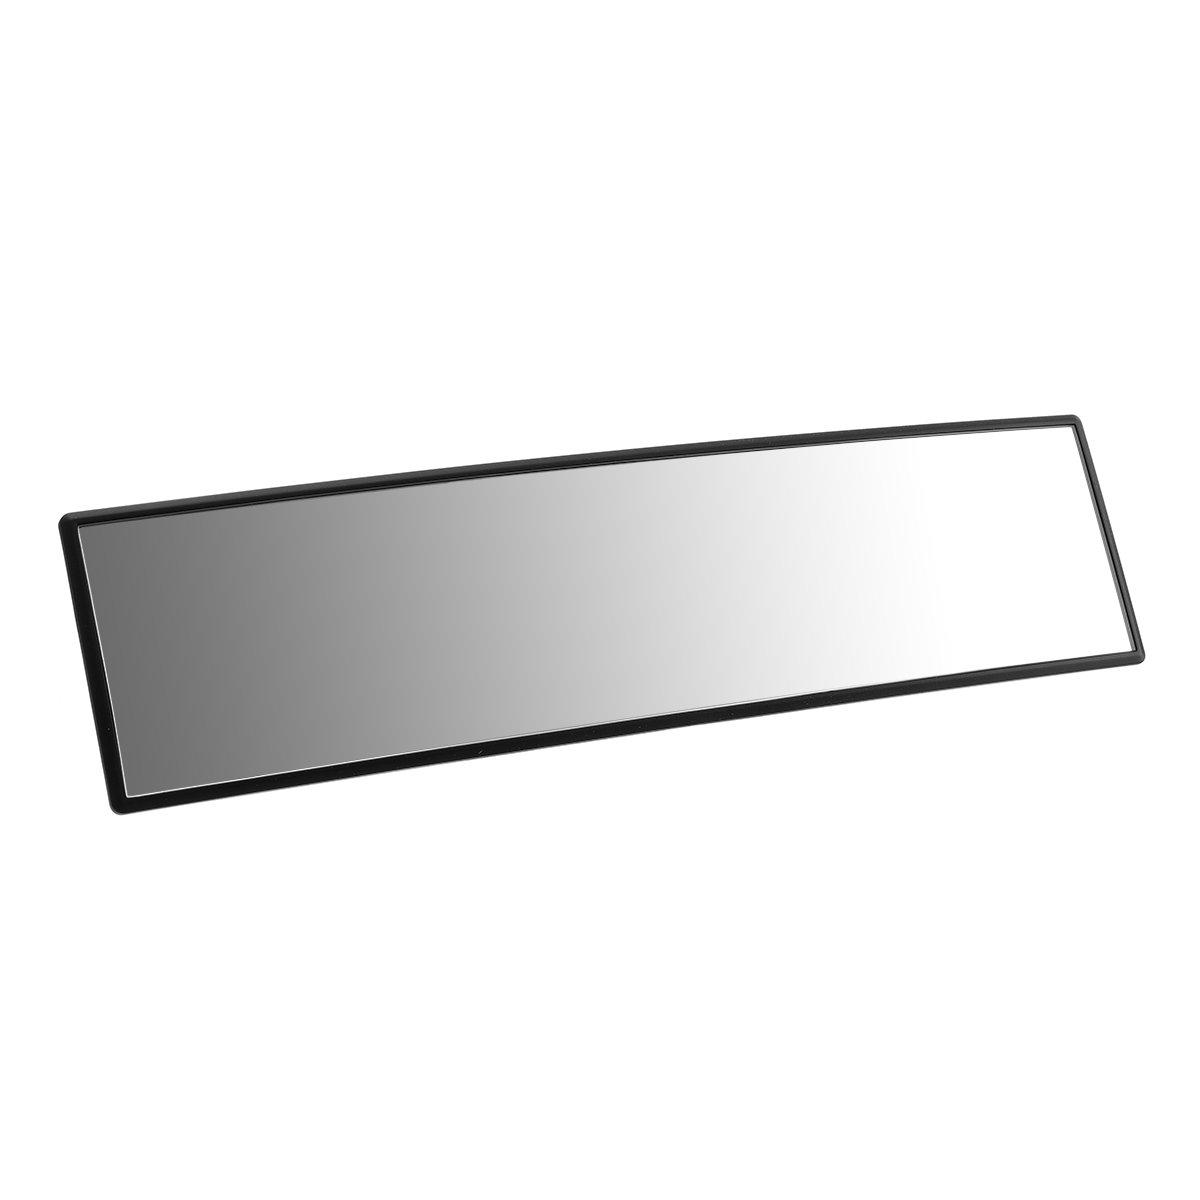 ELUTO Wide Angle Rear View Mirror Universal Interior Curve Convex Rear View Mirror Clip on Original Mirror 12'' (305mm)